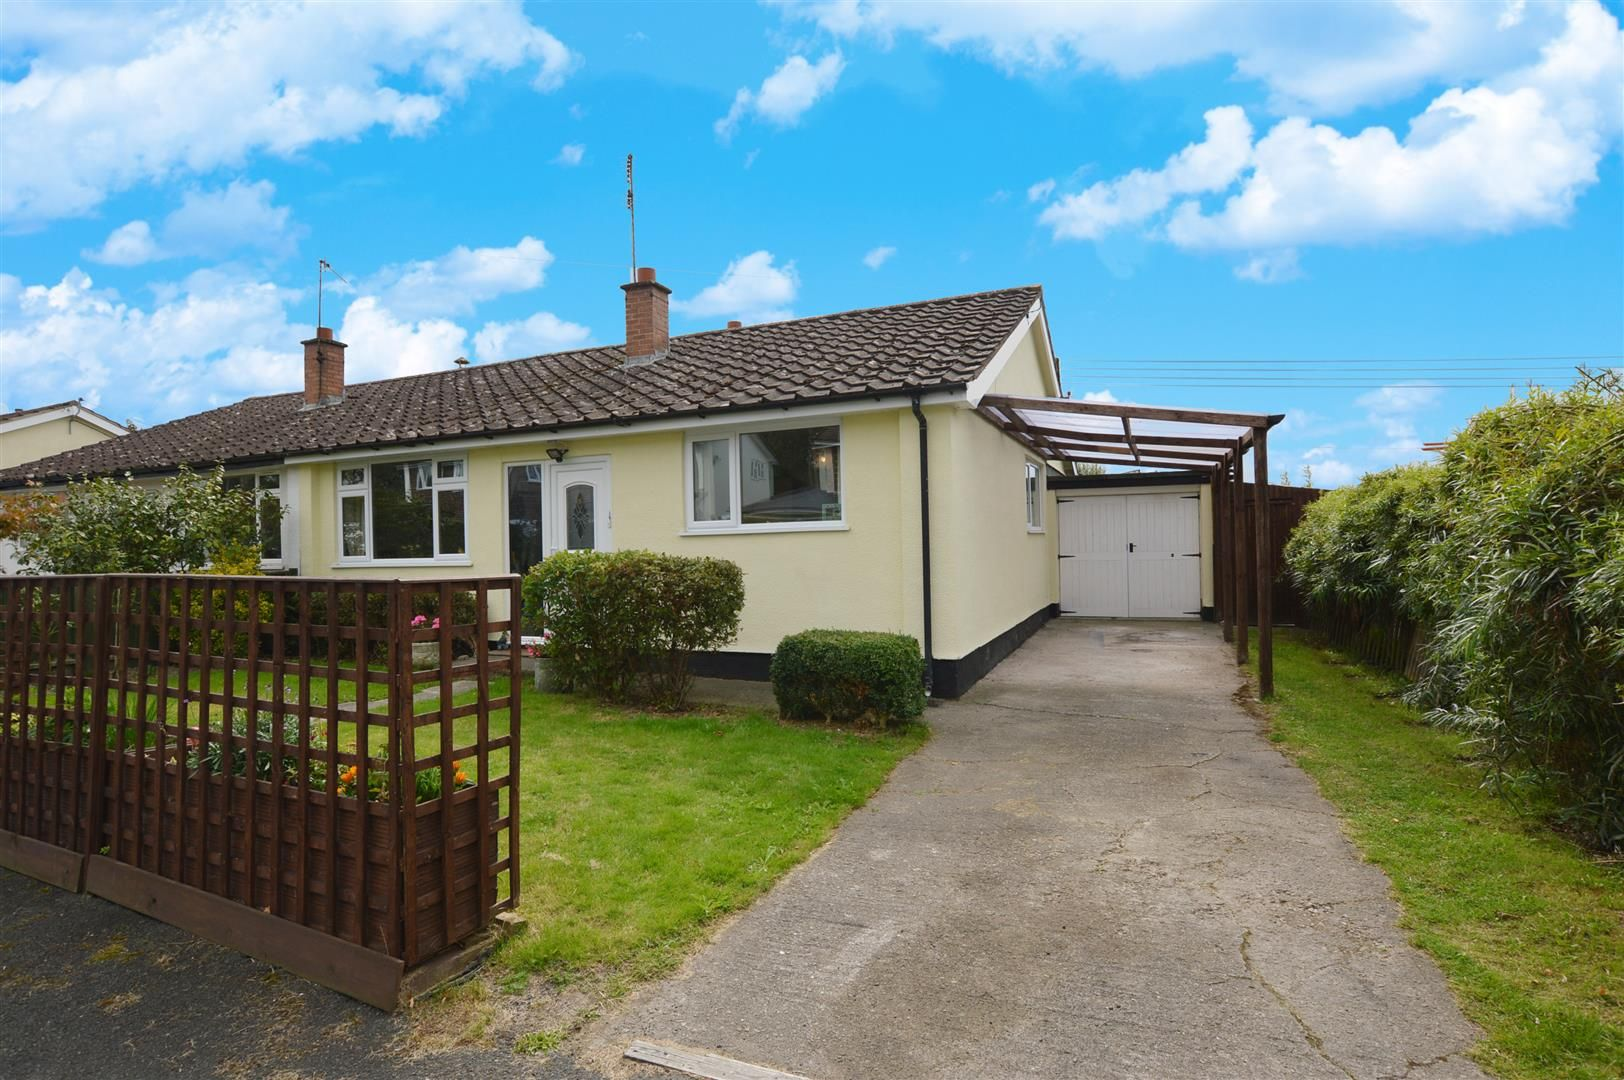 3 bed semi-detached-bungalow for sale in Shobdon 1